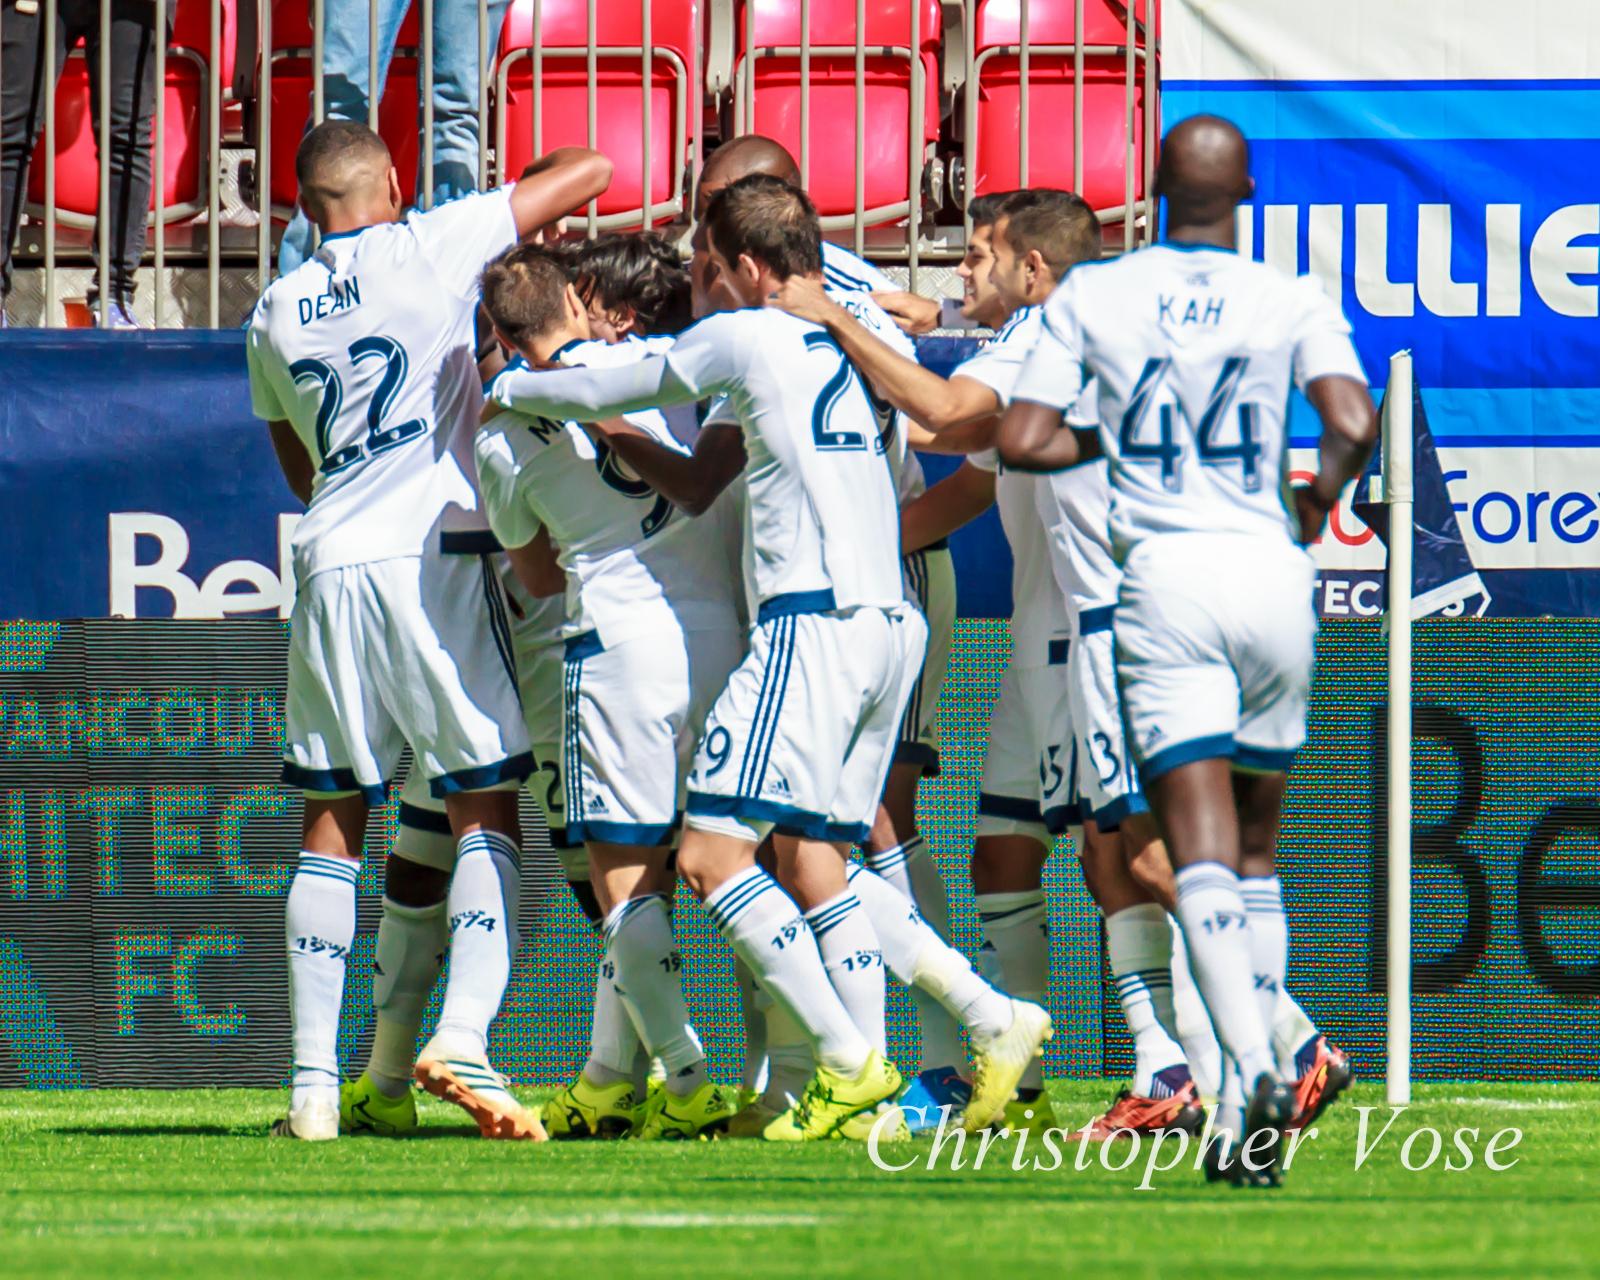 2015-07-26 Mauro Rosales Goal Celebration.jpg